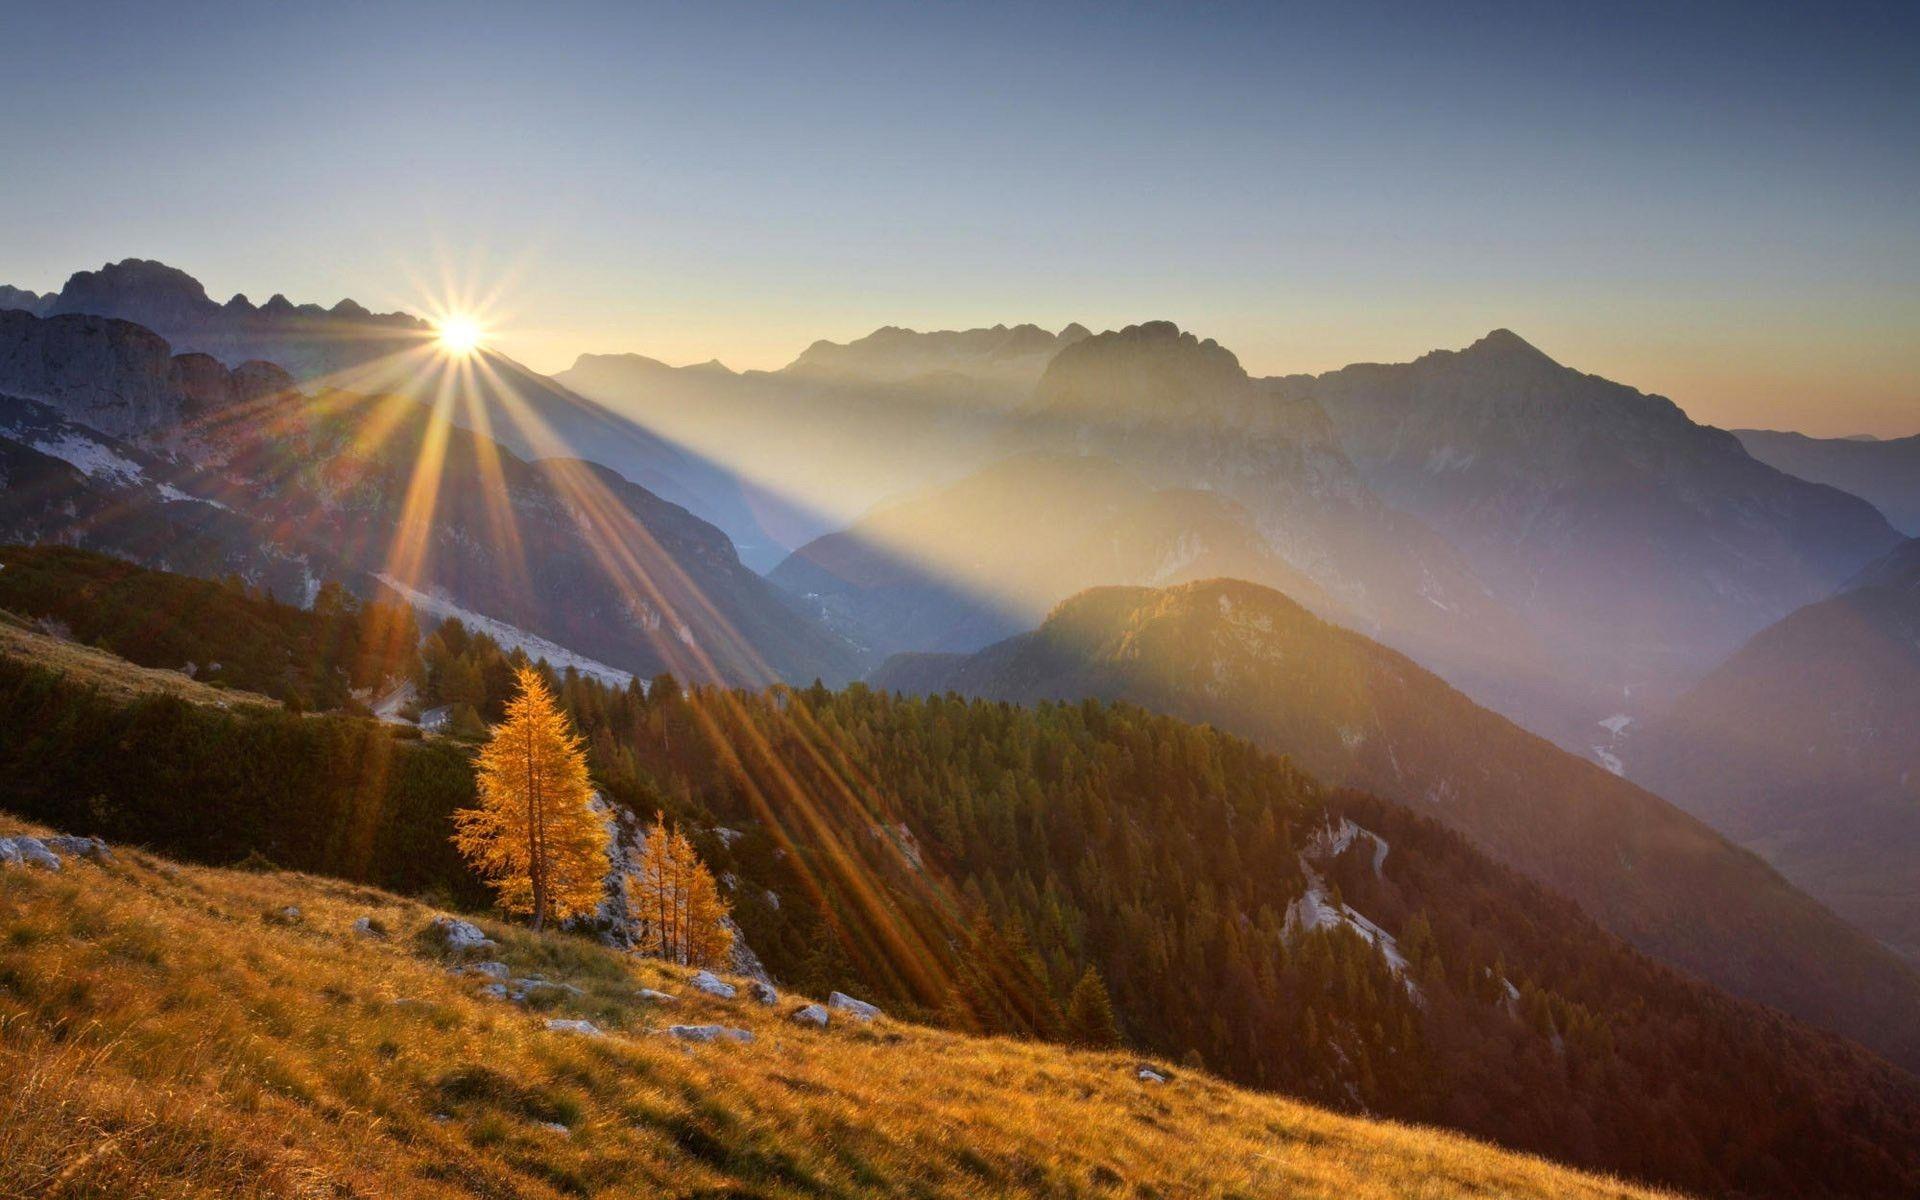 sunrise over mountains wallpaper 3437 Mountain wallpaper